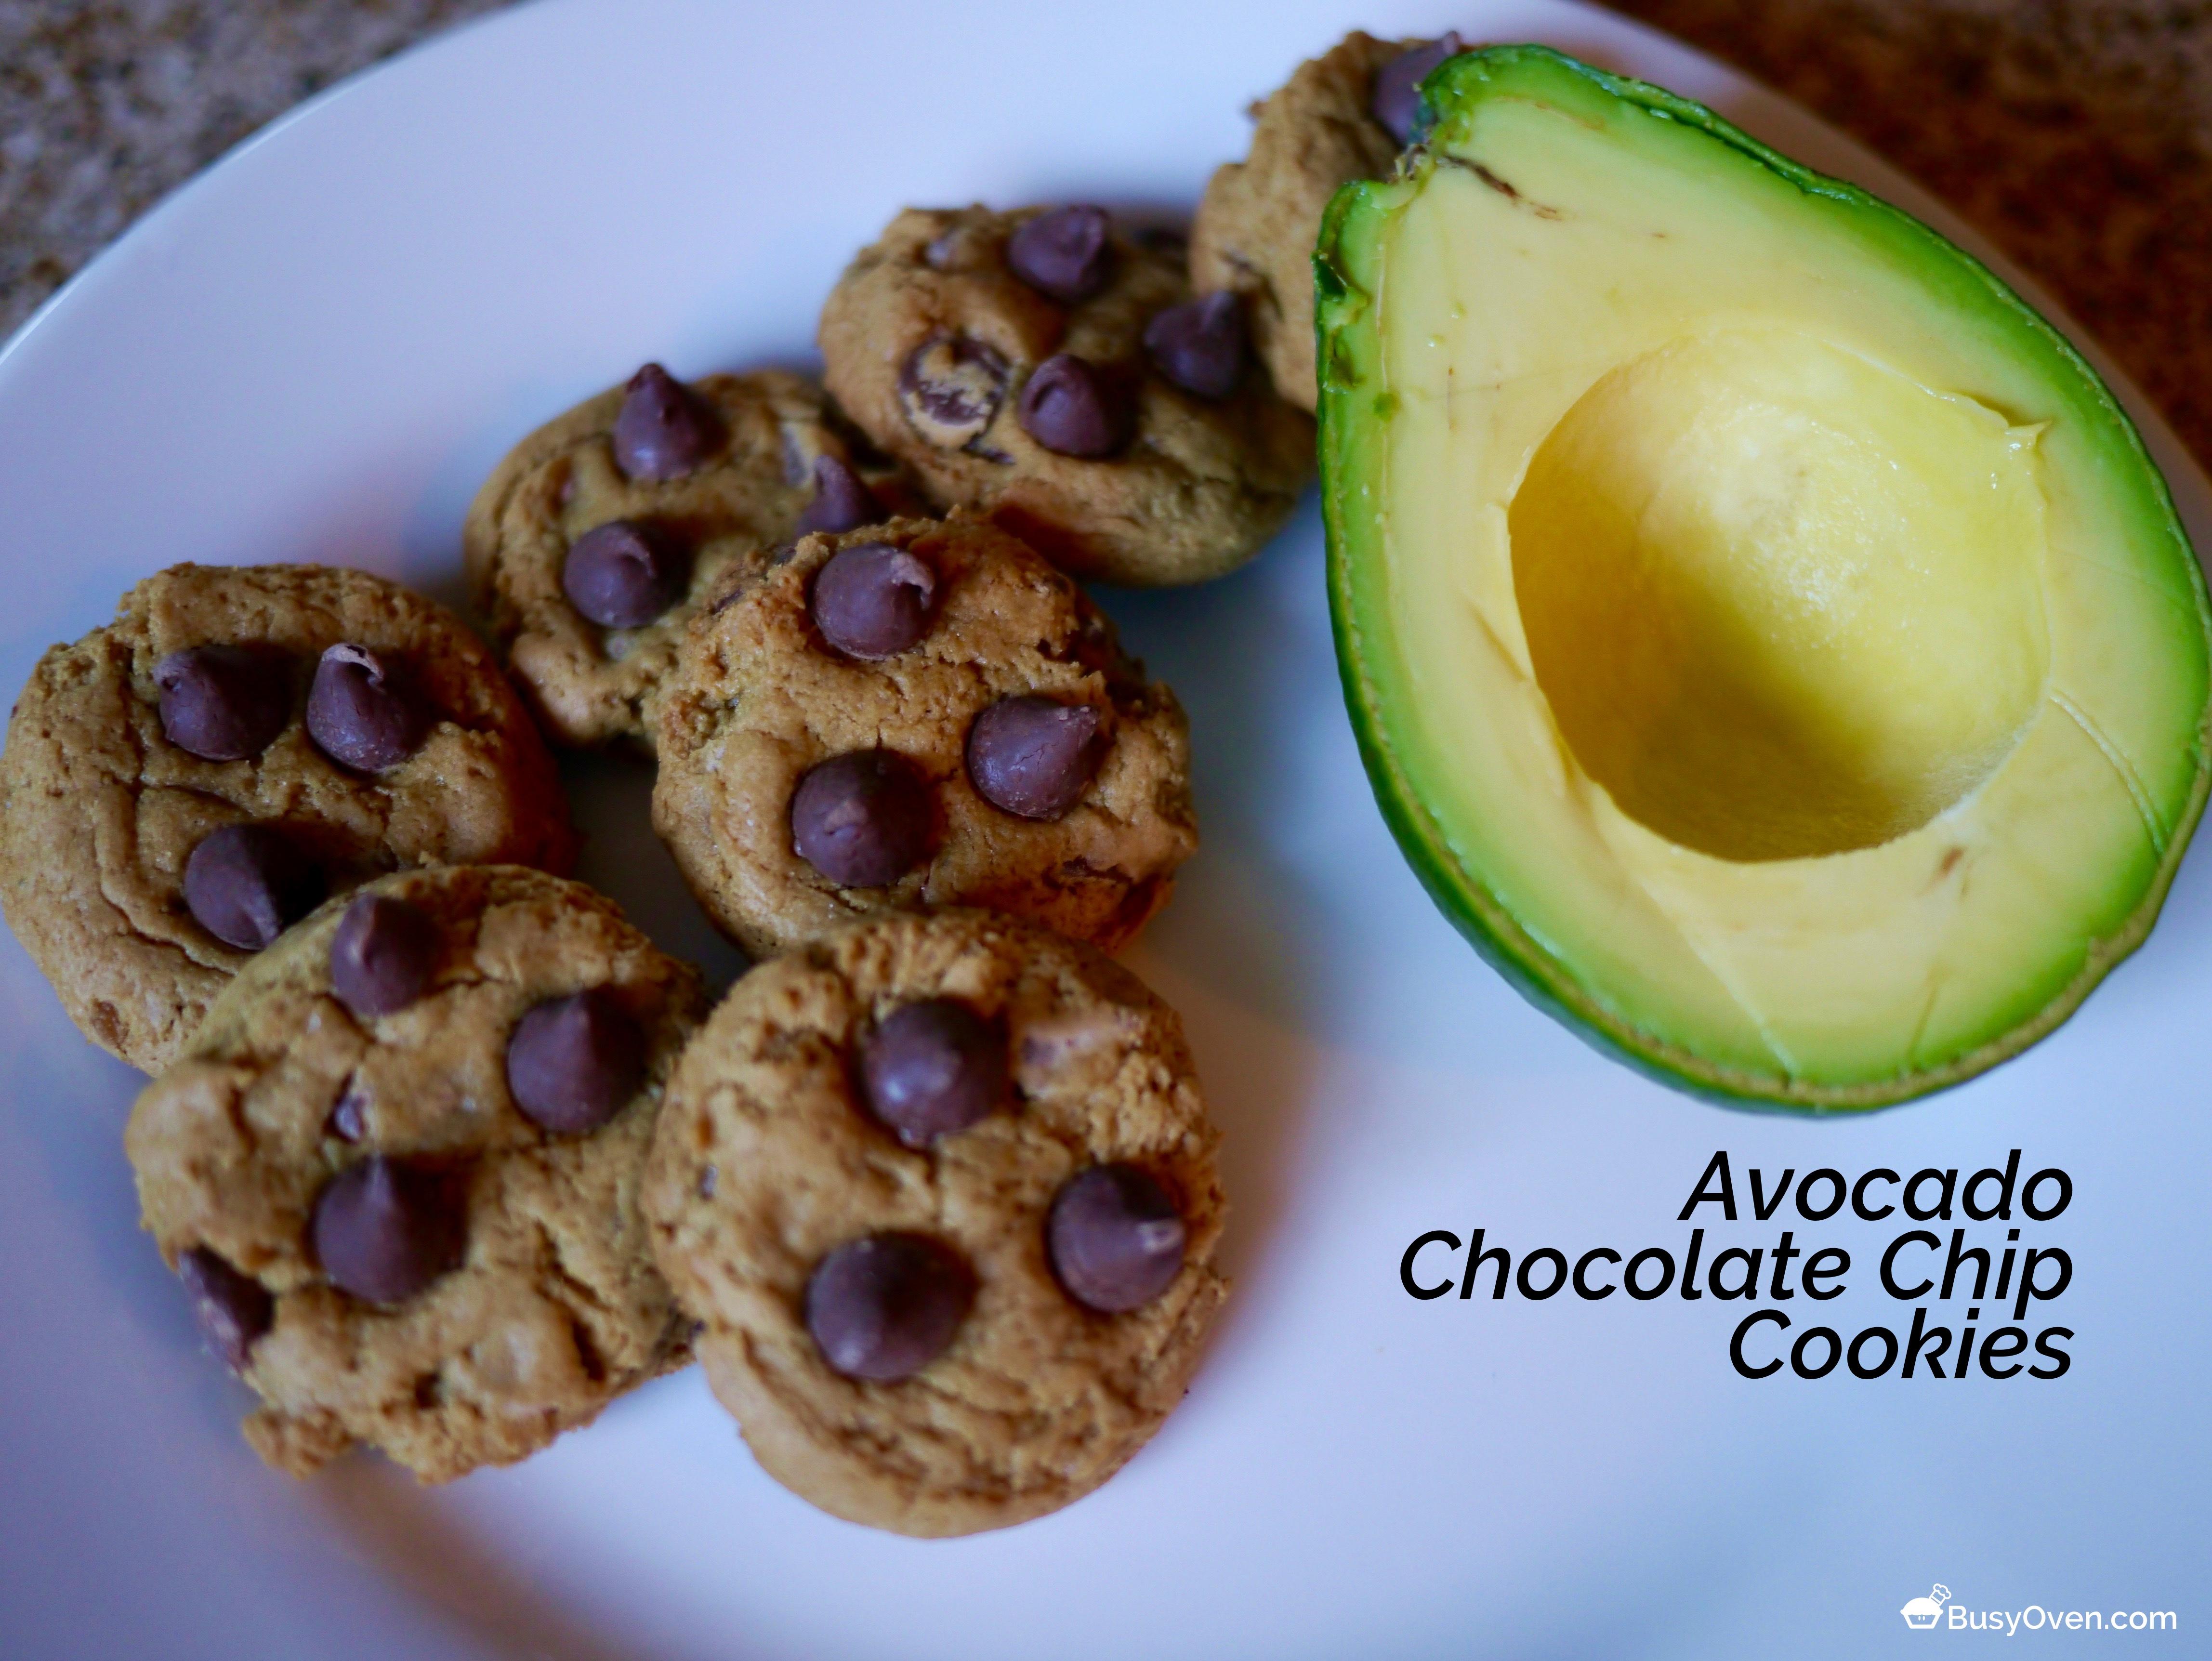 California Avocado Chocolate Chip Cookies